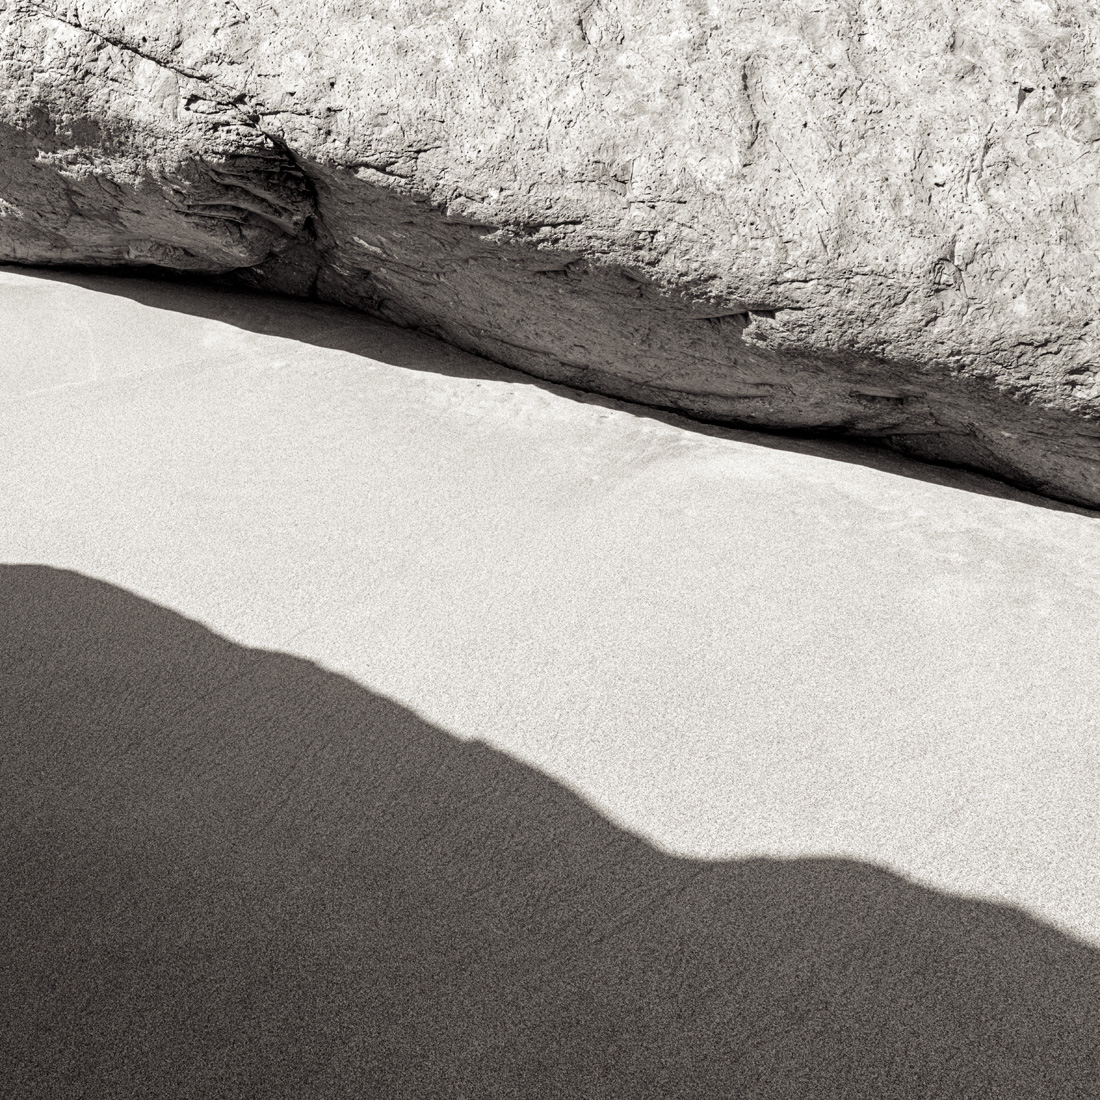 estudio 428. Reguero. 2011 - COAST in ASTURIAS - senén merino, photograph